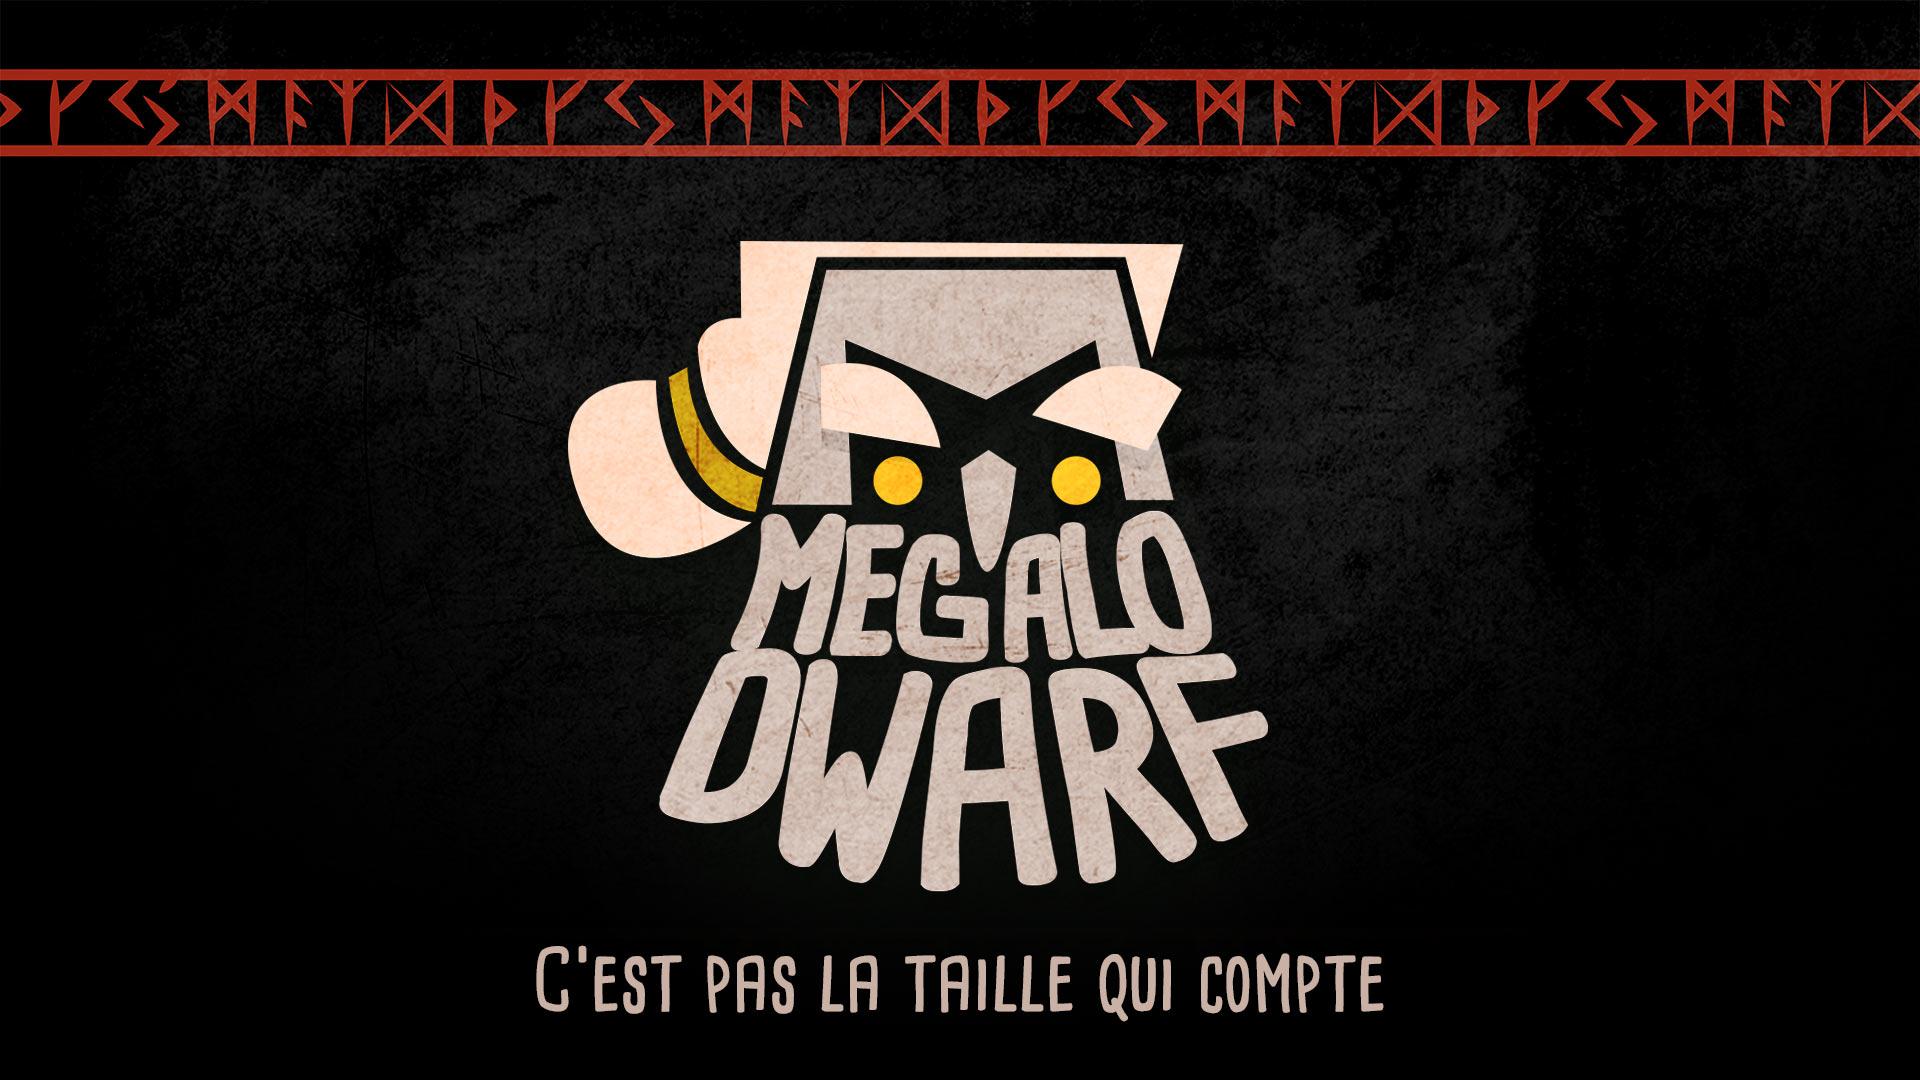 Megalo Dwarf